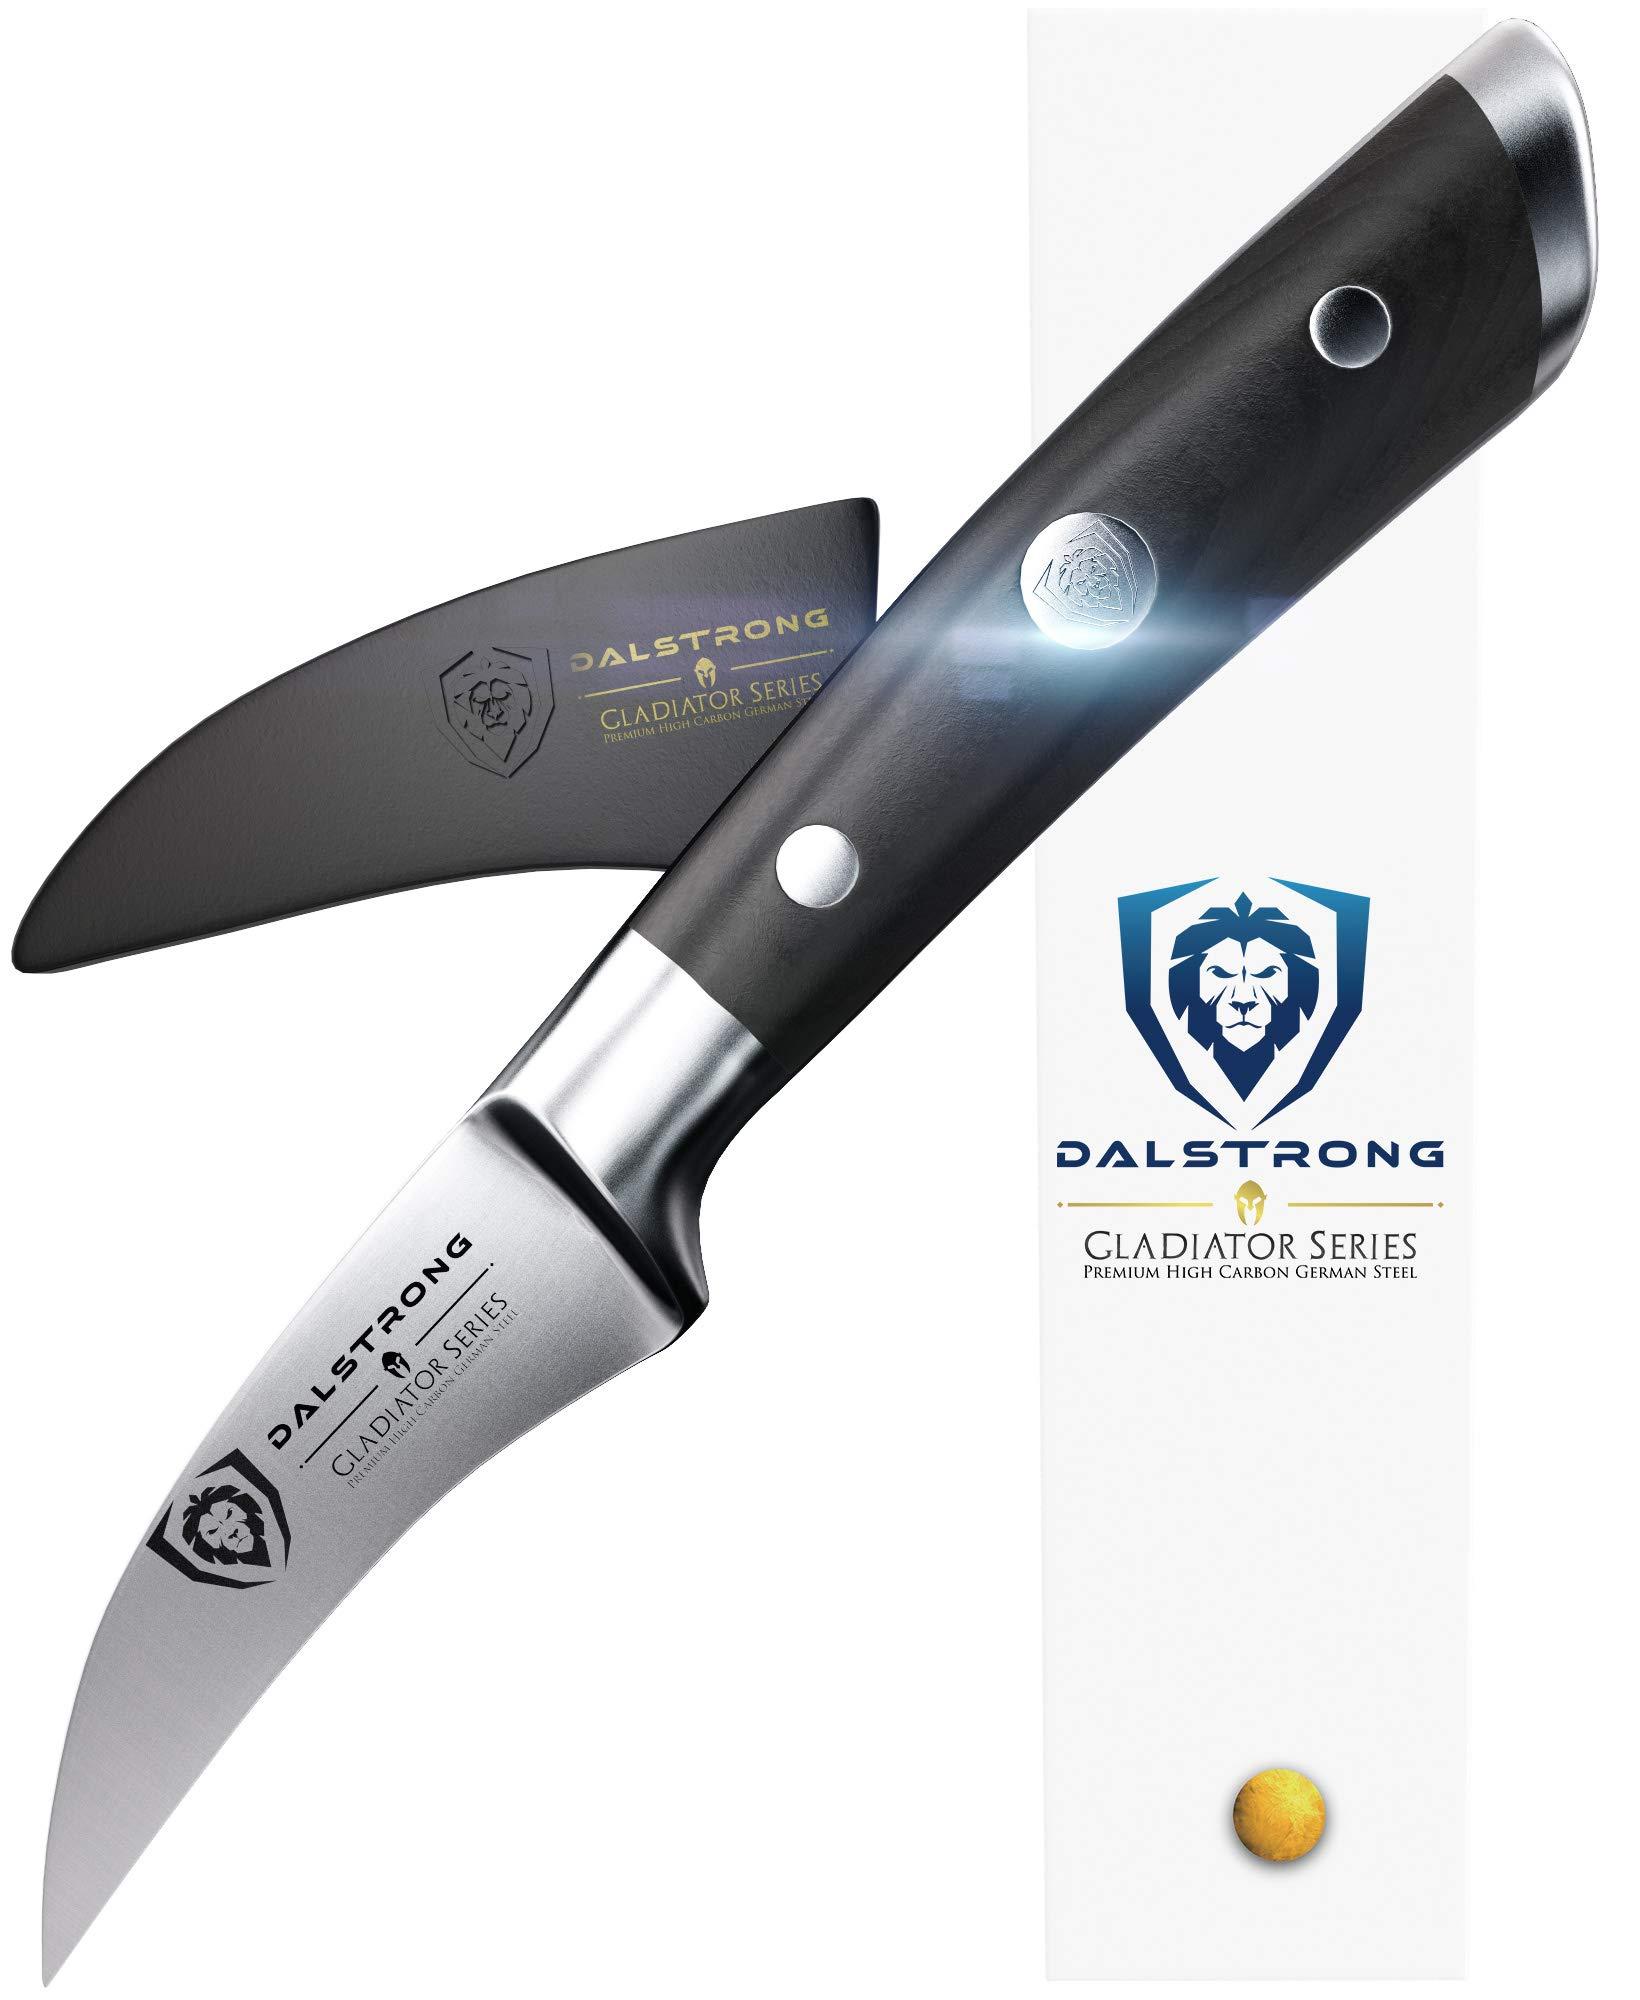 DALSTRONG Paring Tourne Knife Peeler - Gladiator Series - Birds Beak Peeling - German HC Steel - 2.75'' by Dalstrong